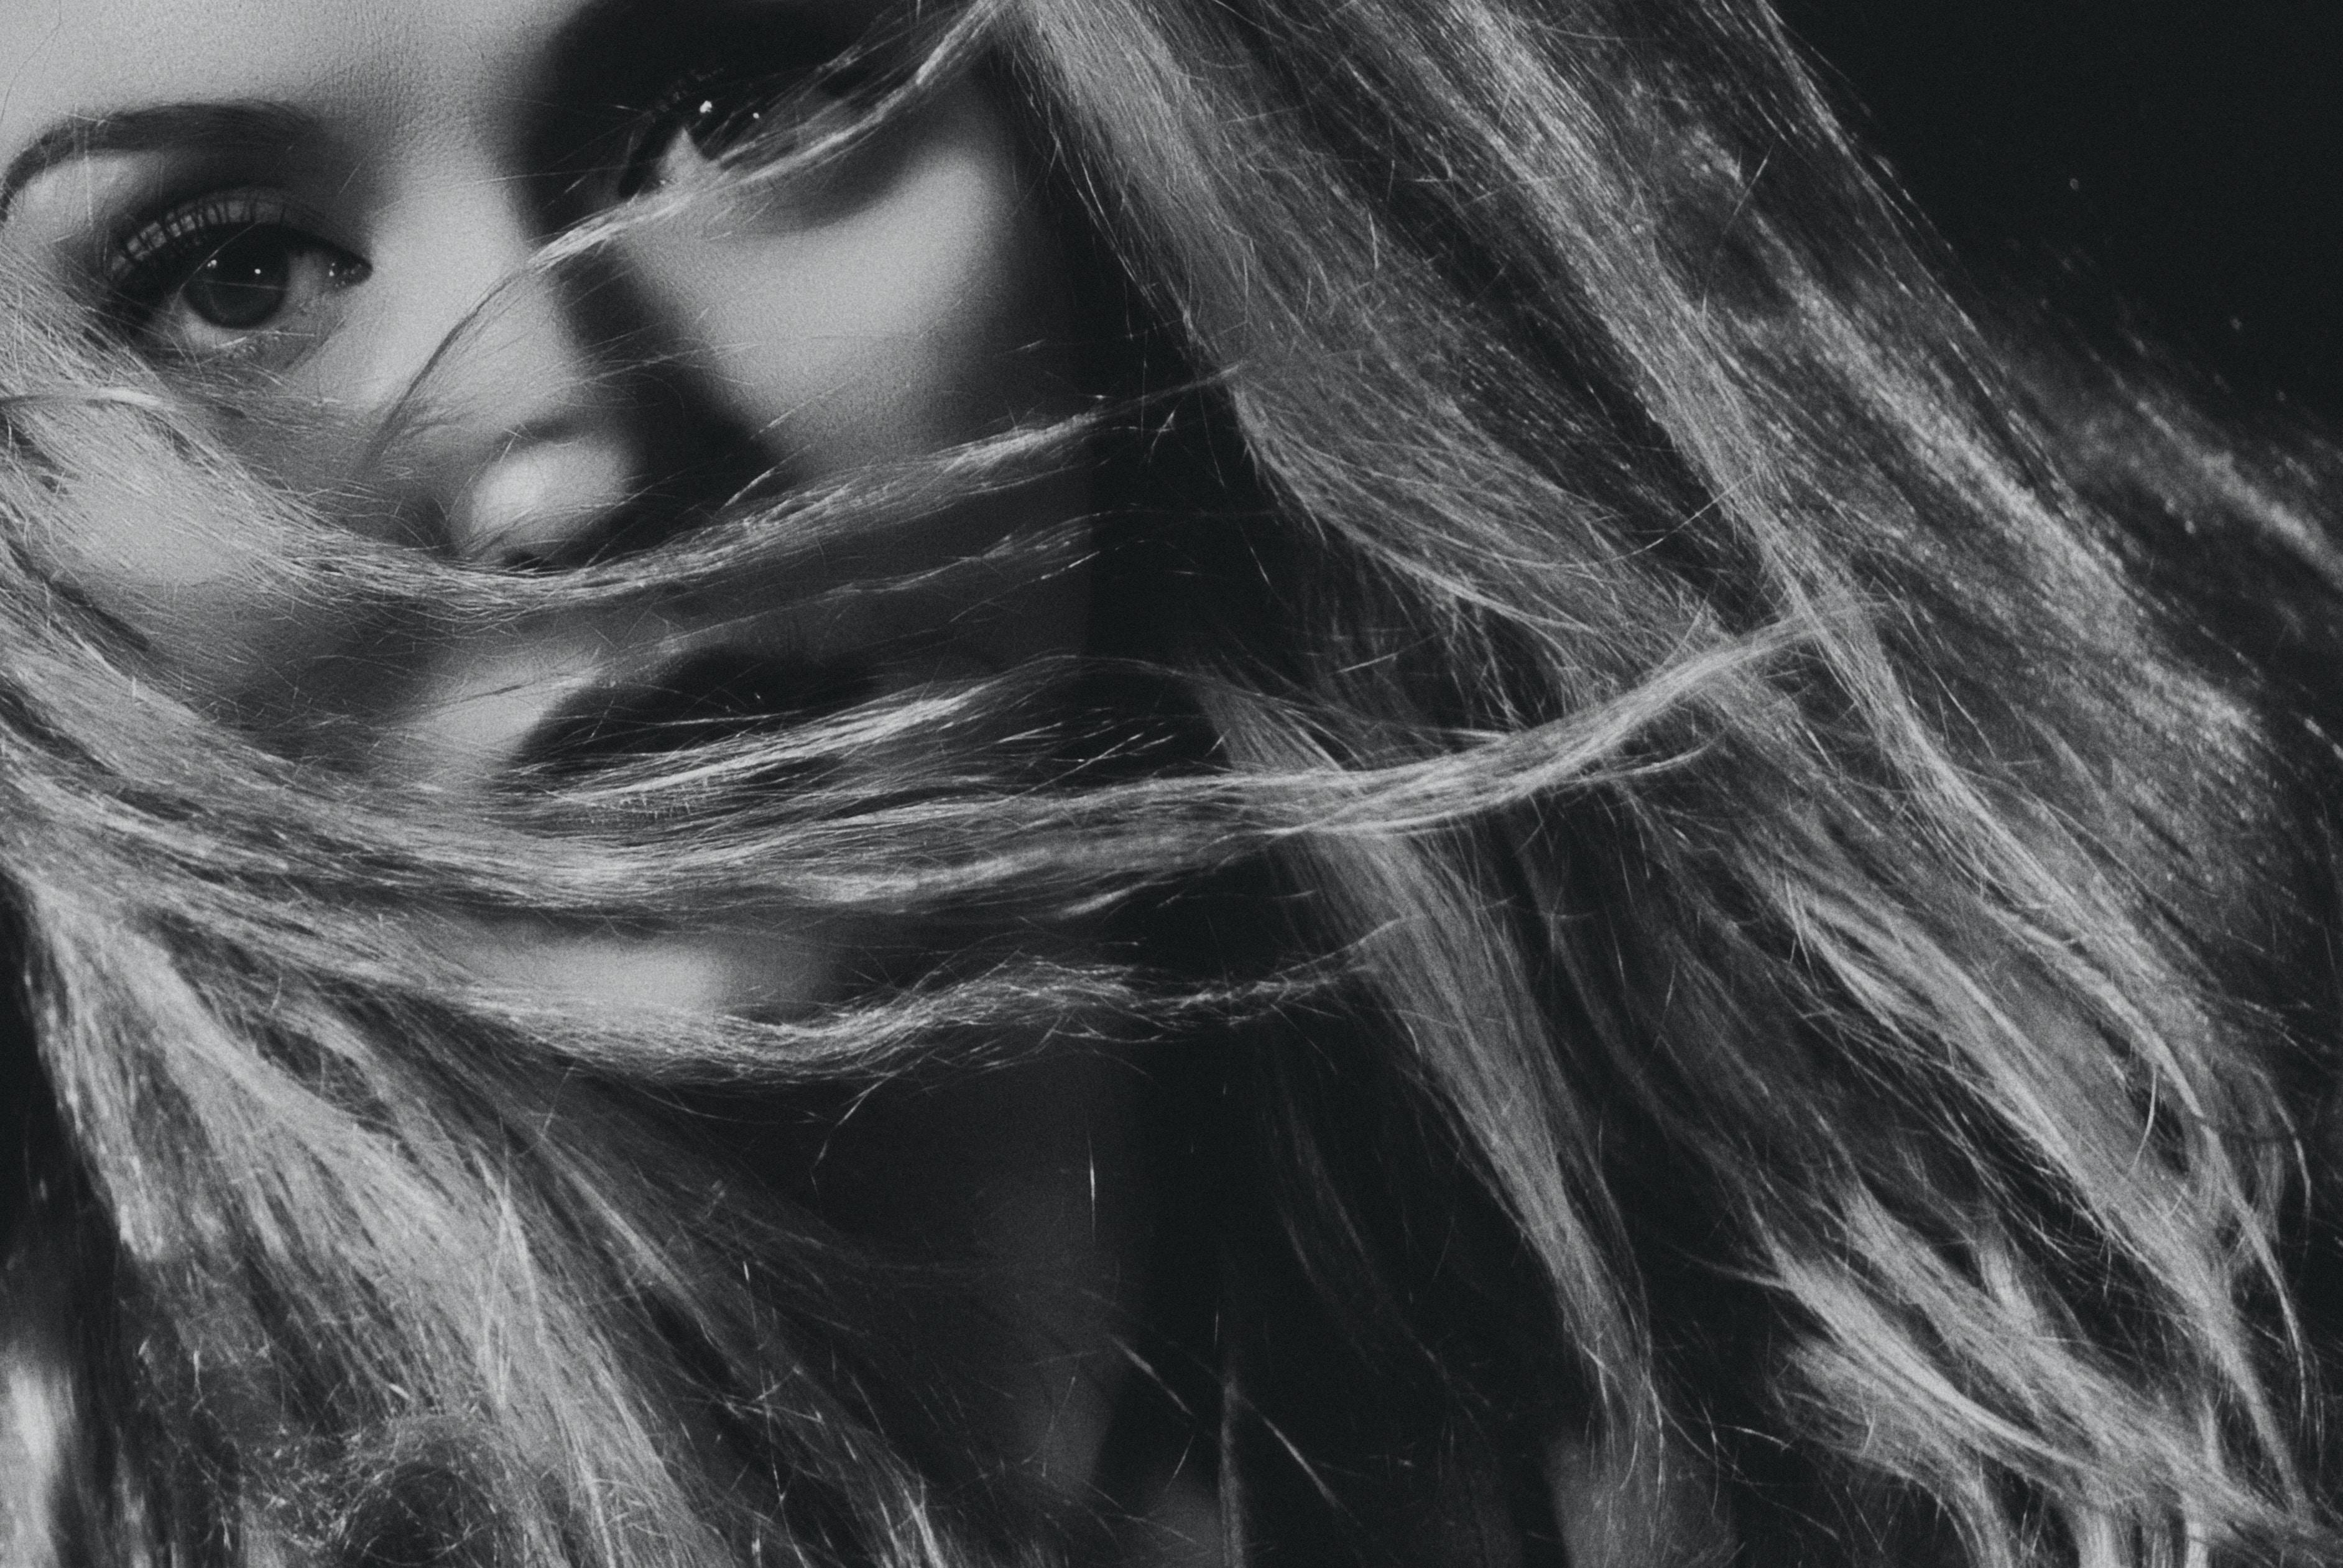 grayscale photo of woman portrait